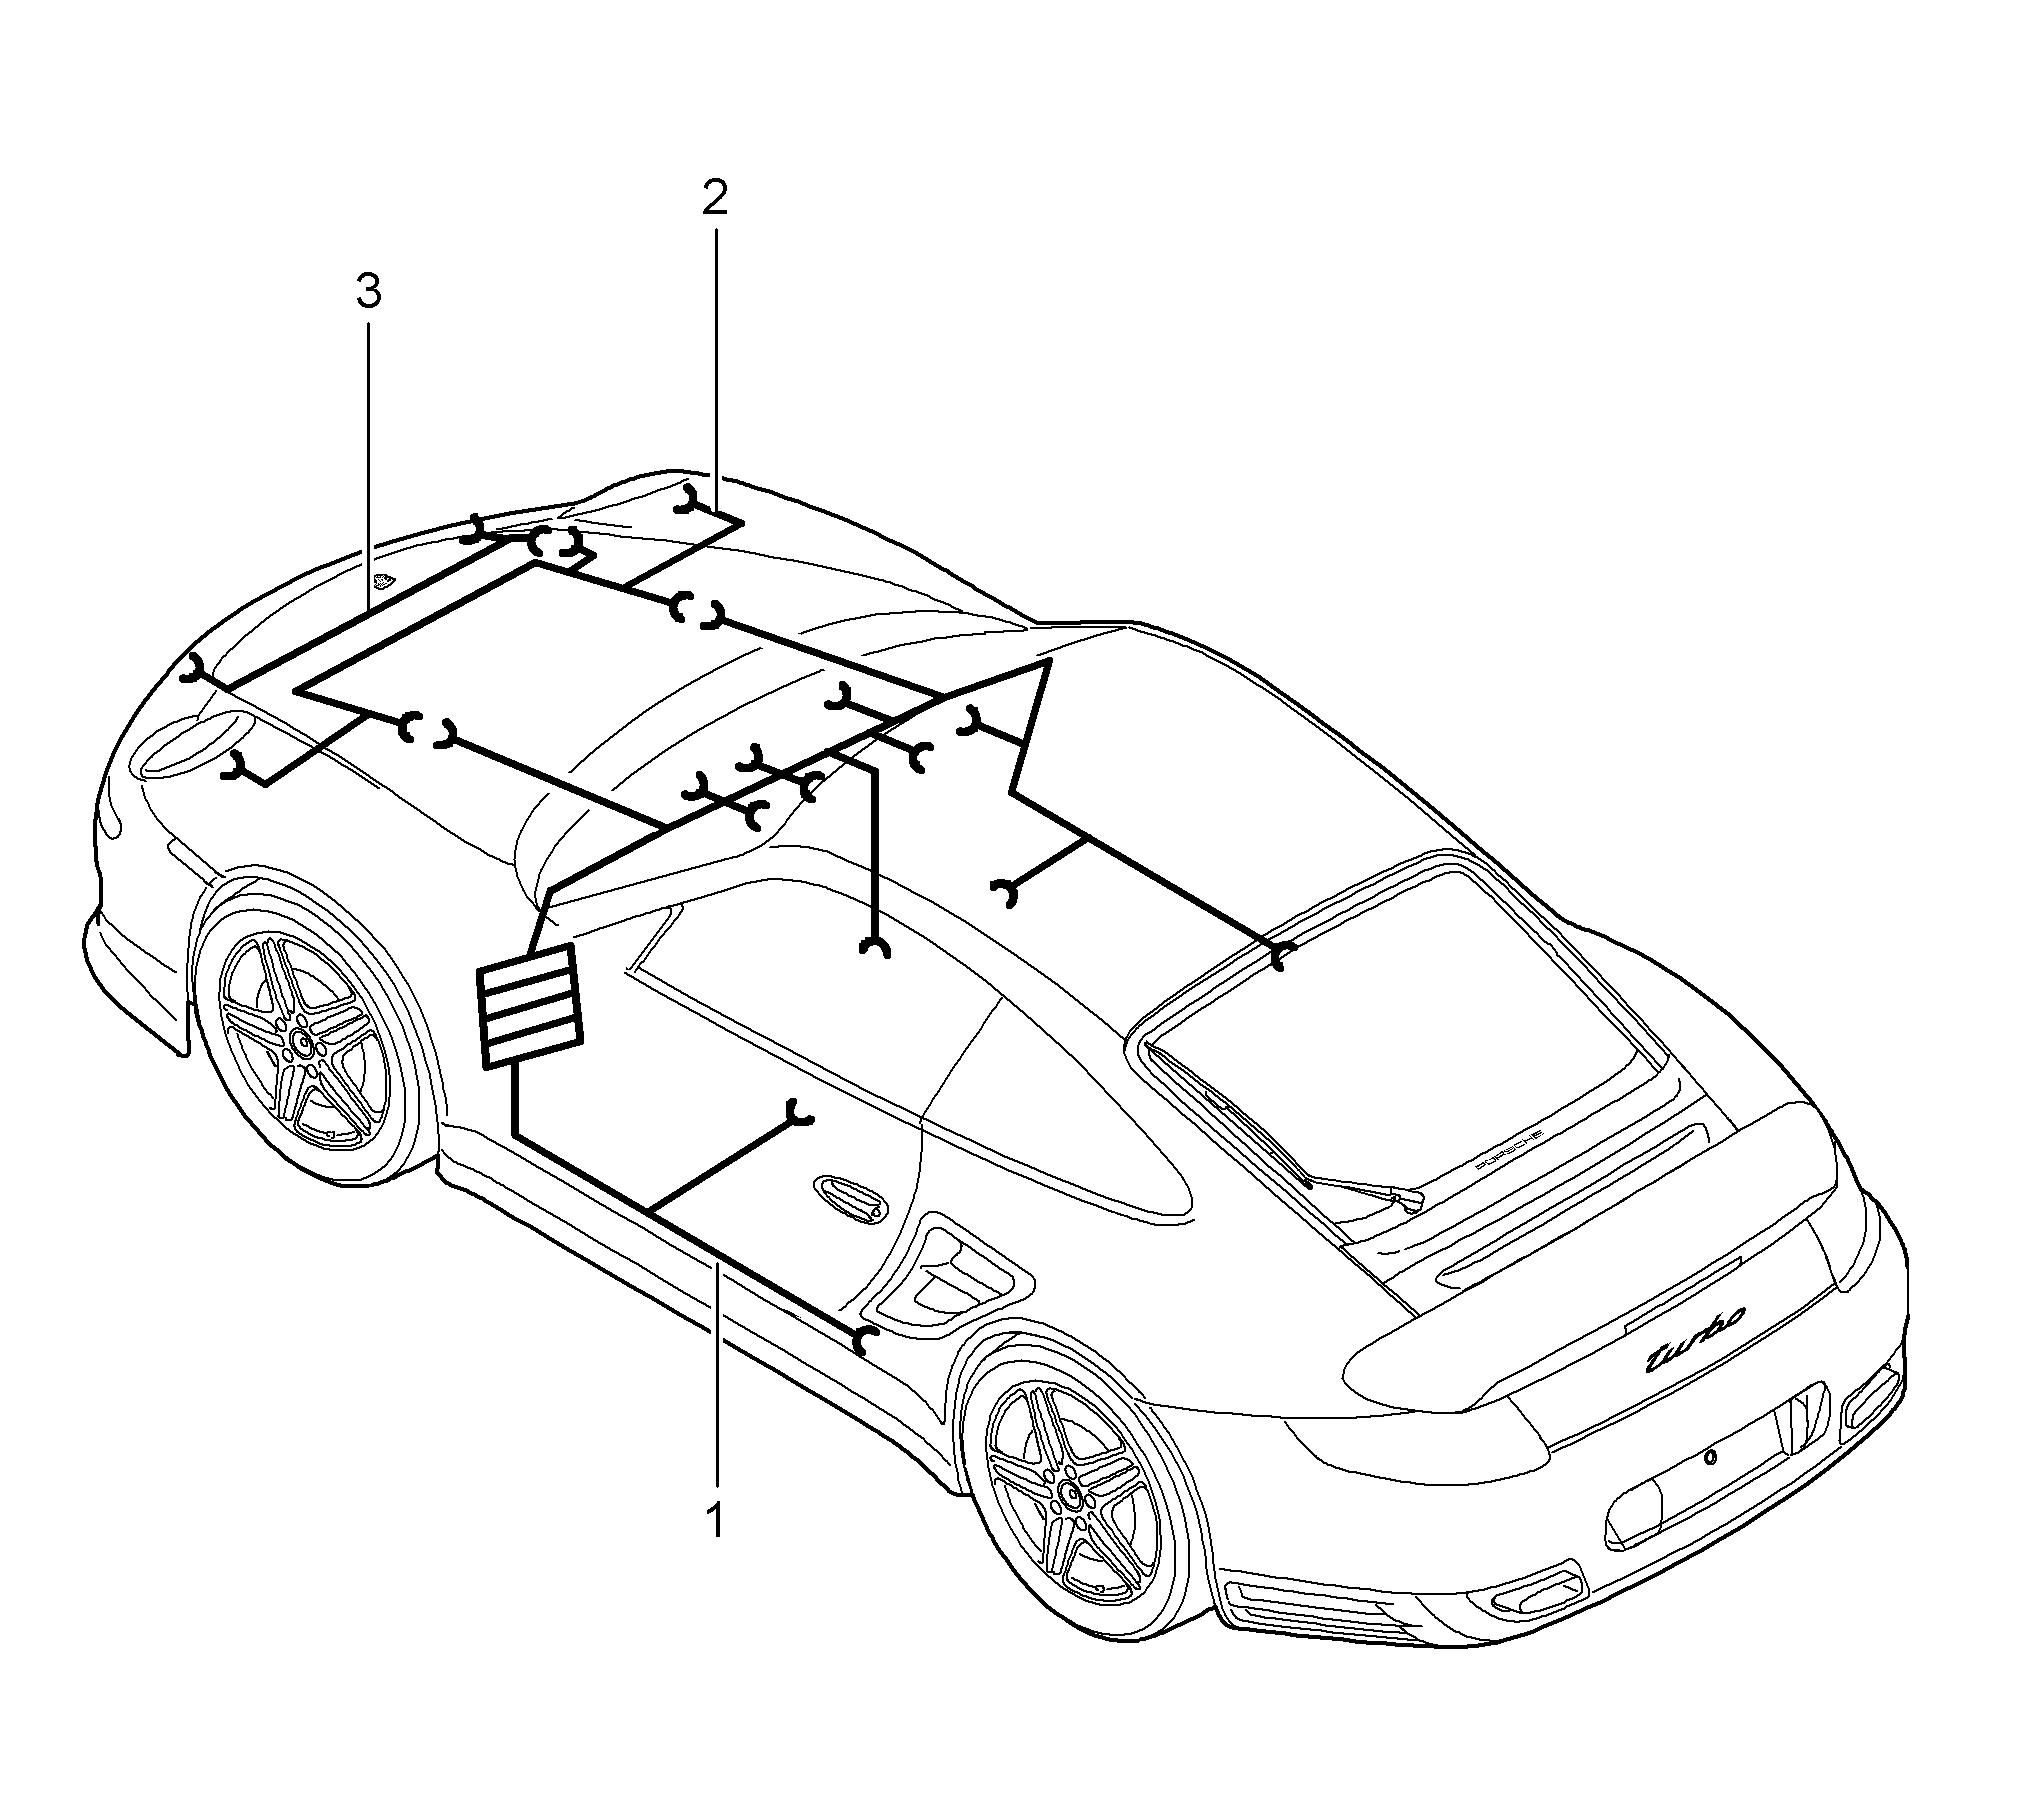 Porsche 911 Turbo Gt2 2007 2009 Shock Absorber Seat Belt Wiring Harness Pet